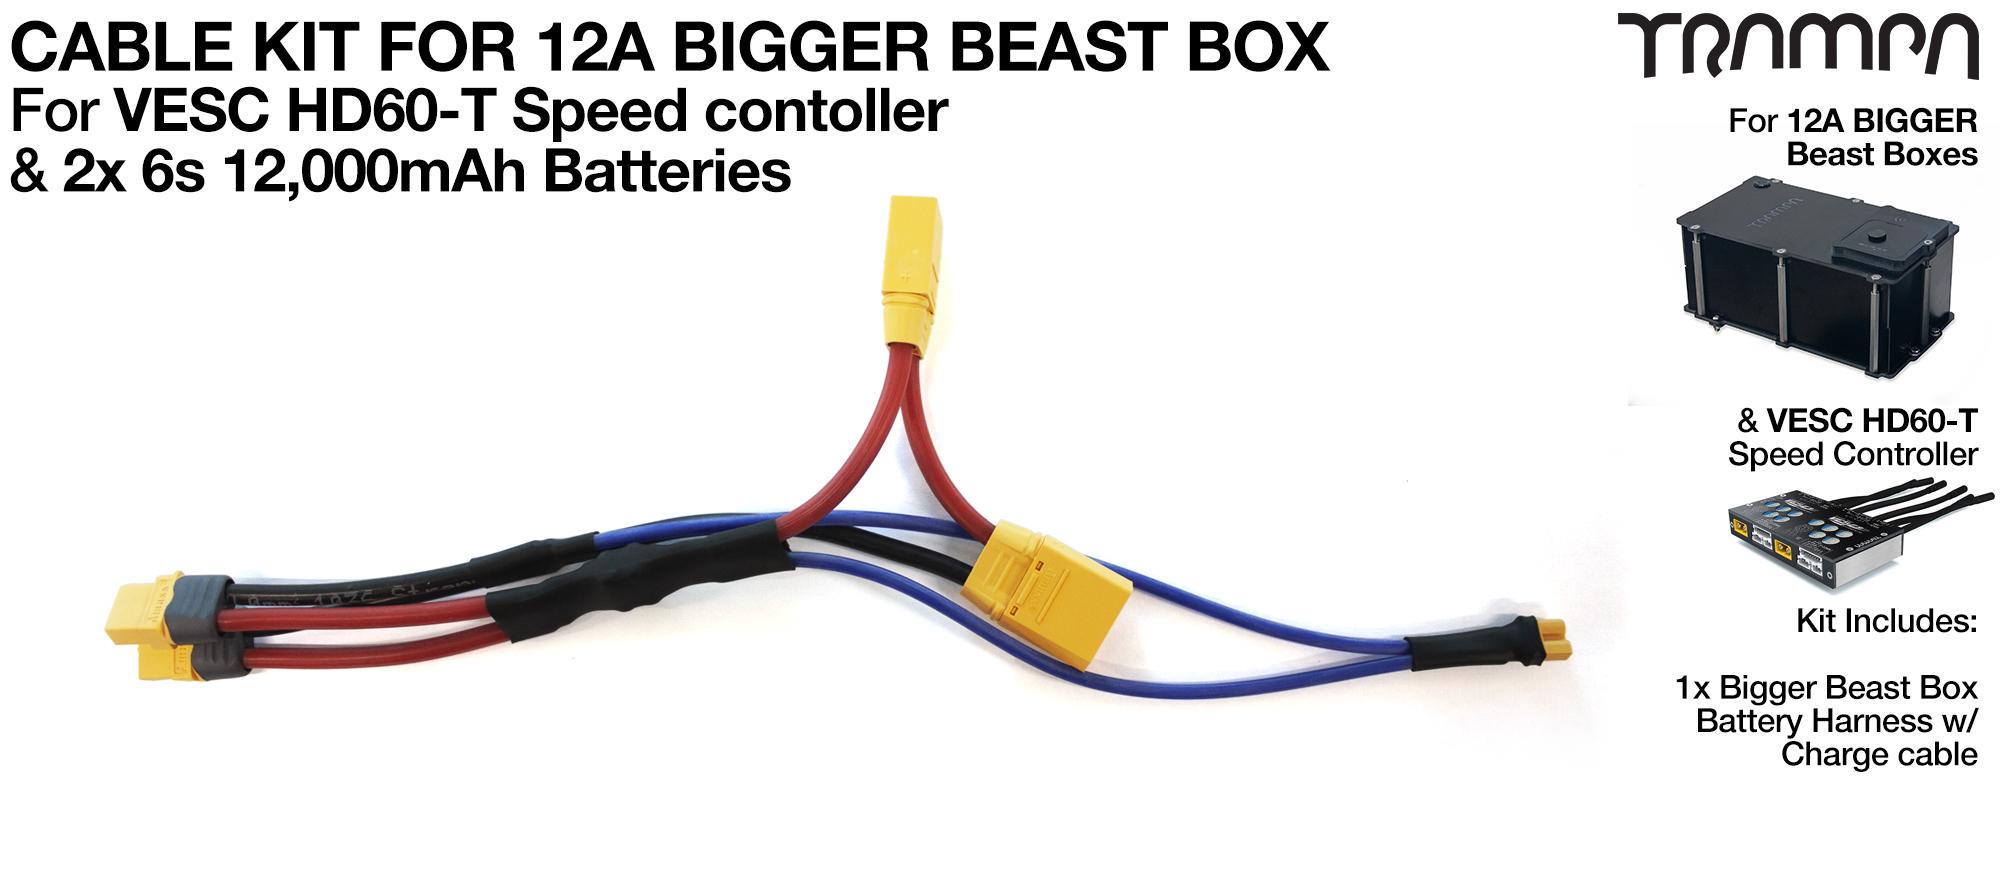 12A Bigger BEAST BOX & Hd-60T VESC Cable Kit